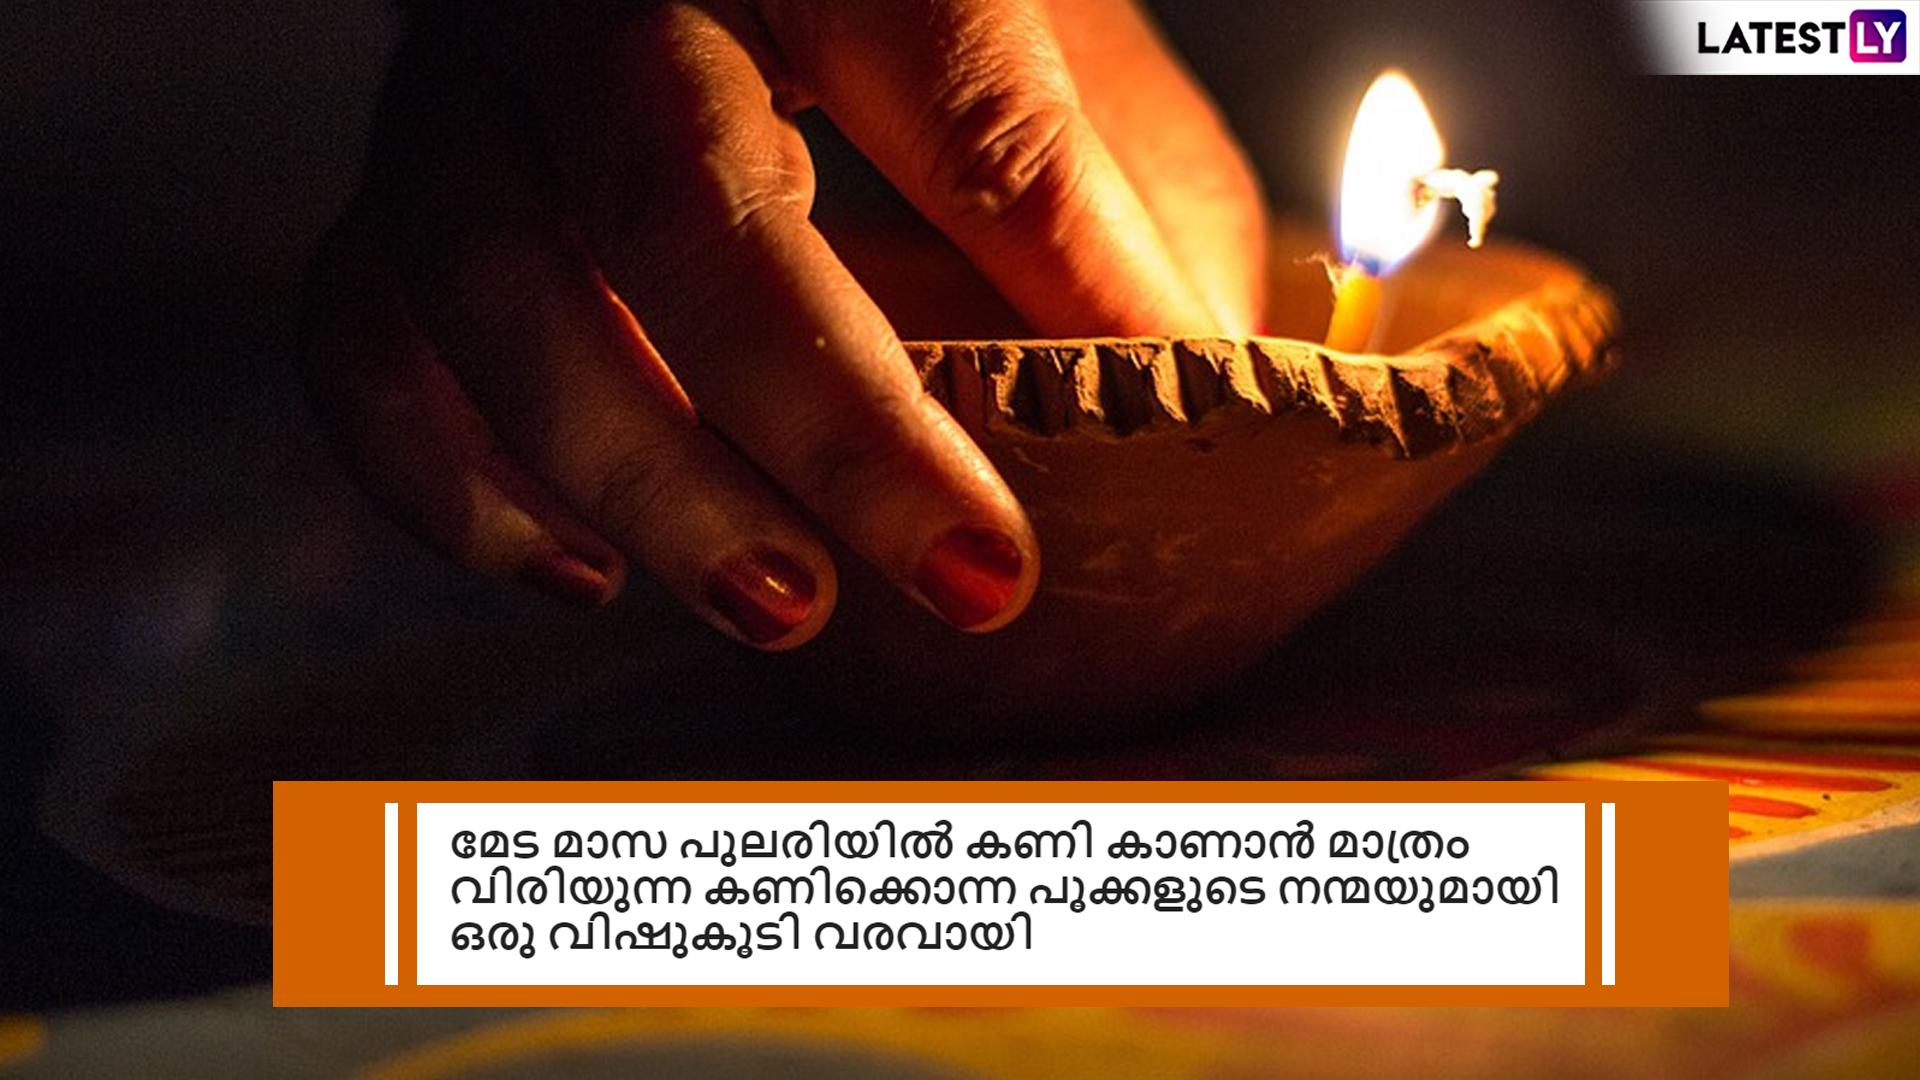 Happy Vishu 2019 Messages In Malayalam Whatsapp Stickers Greetings